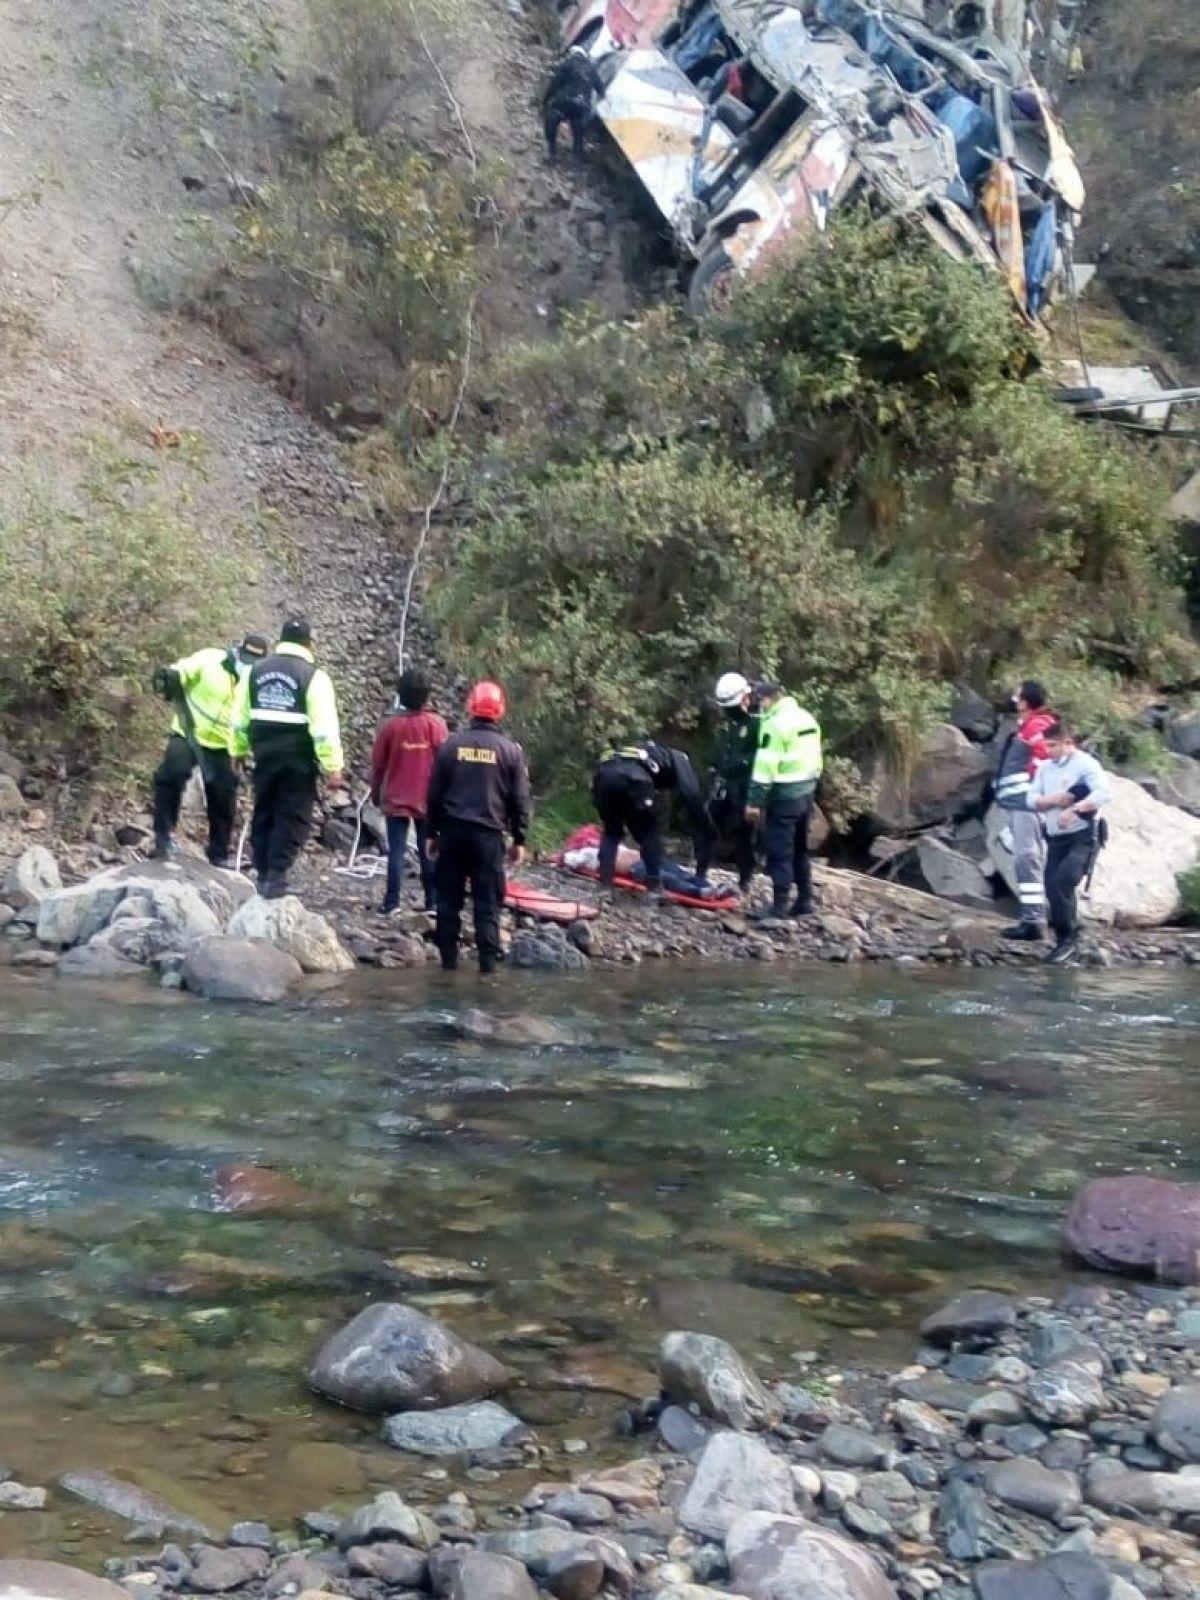 Peru'da otobüs uçuruma yuvarlandı: 29 ölü #4